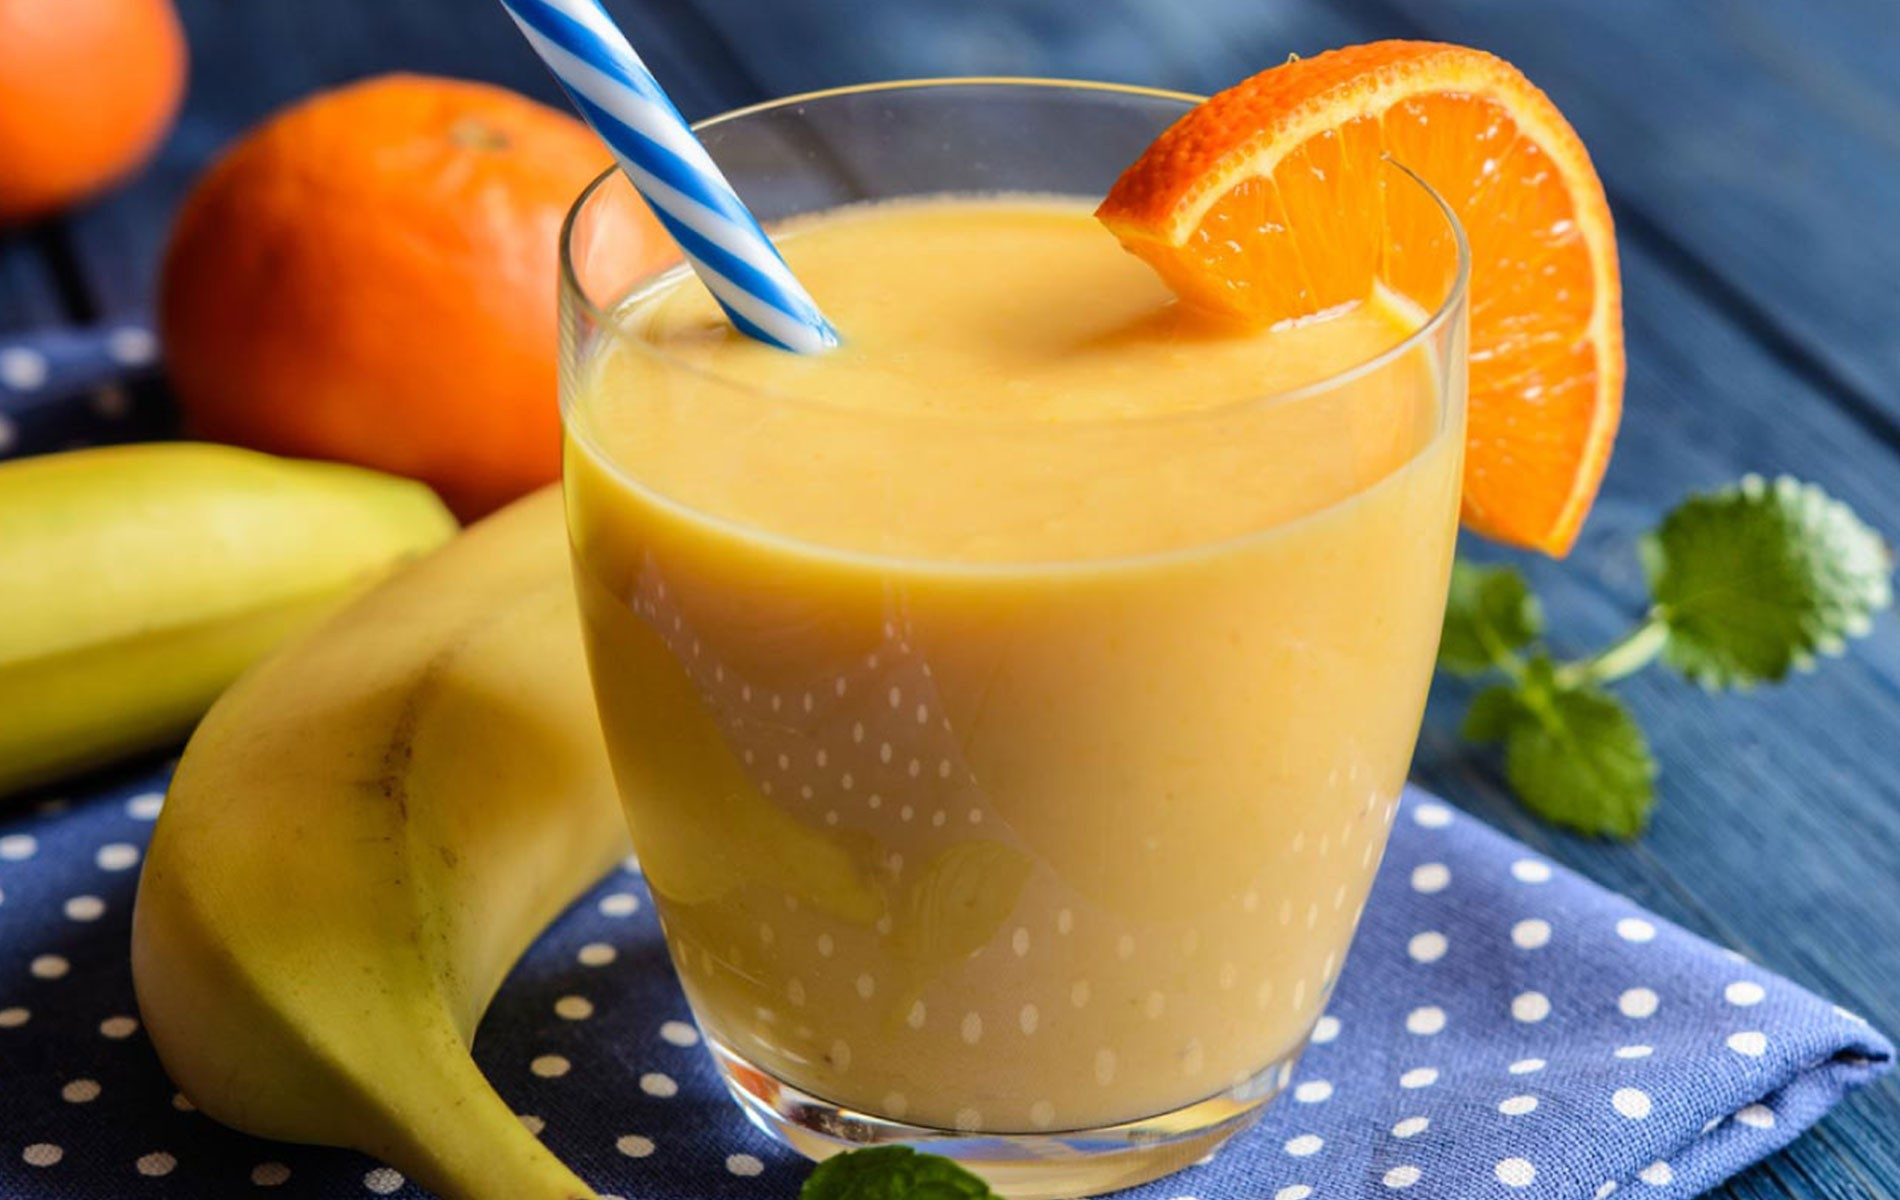 produits-naturel-probiotique-lomme-lambersart